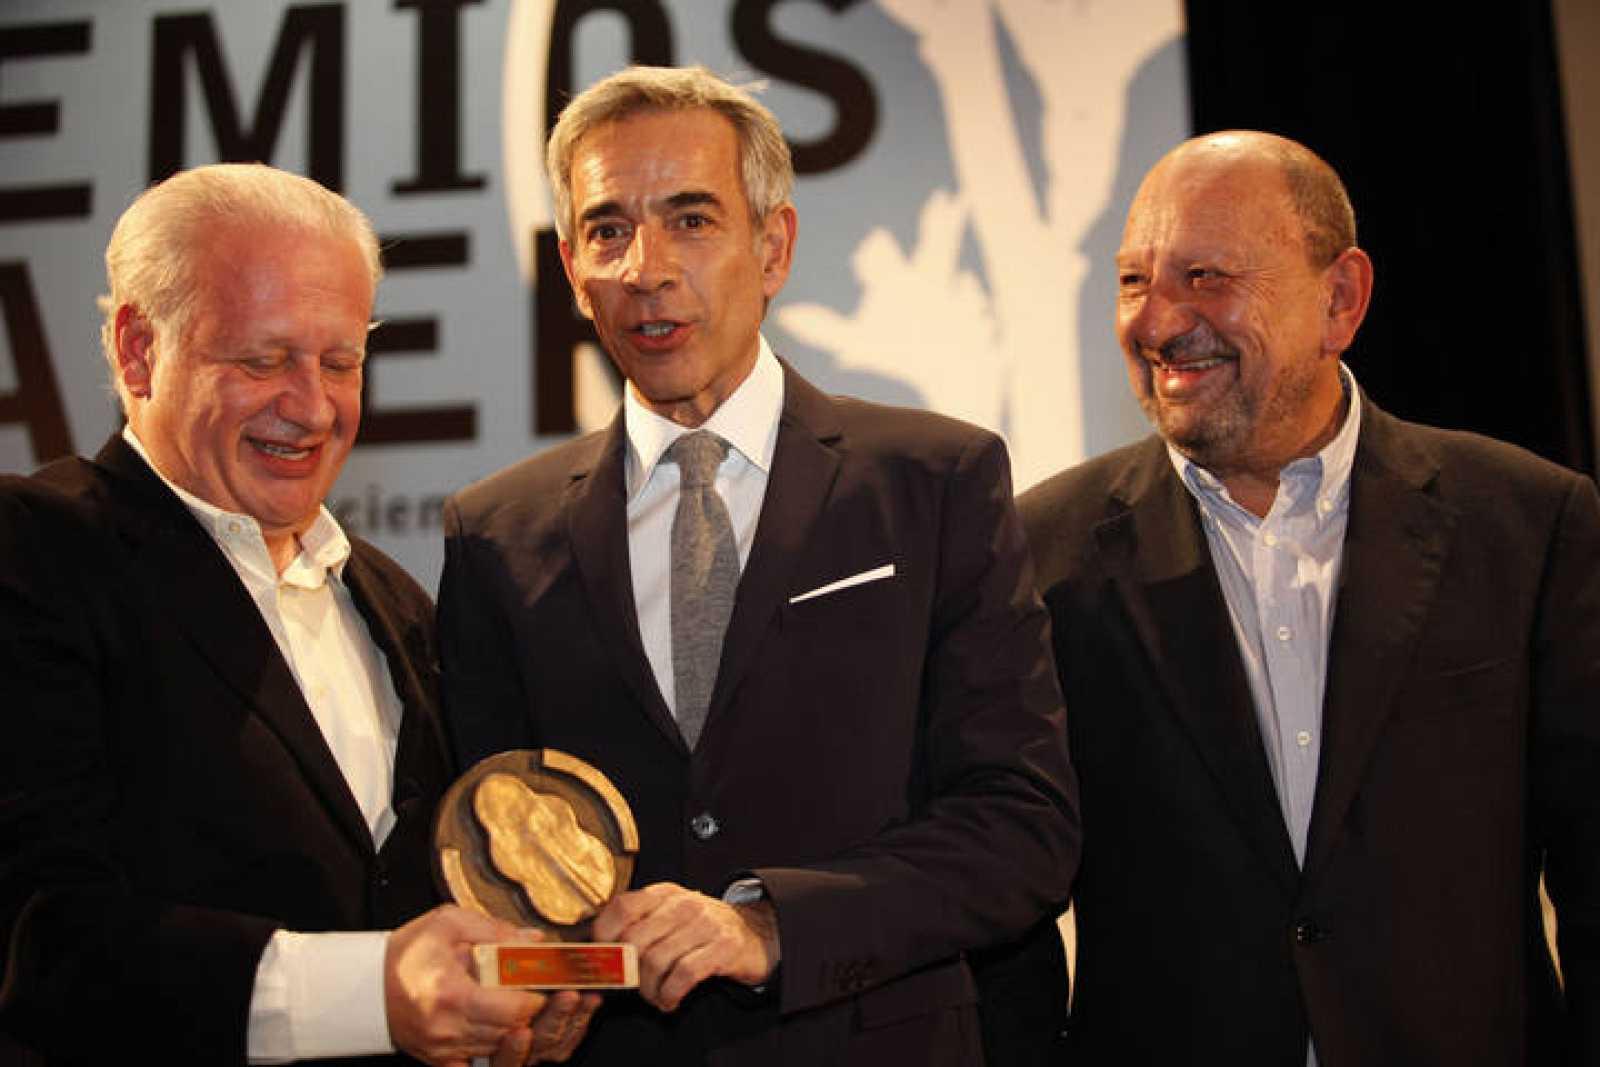 Juan e Imanol recogen el premio LAUDER